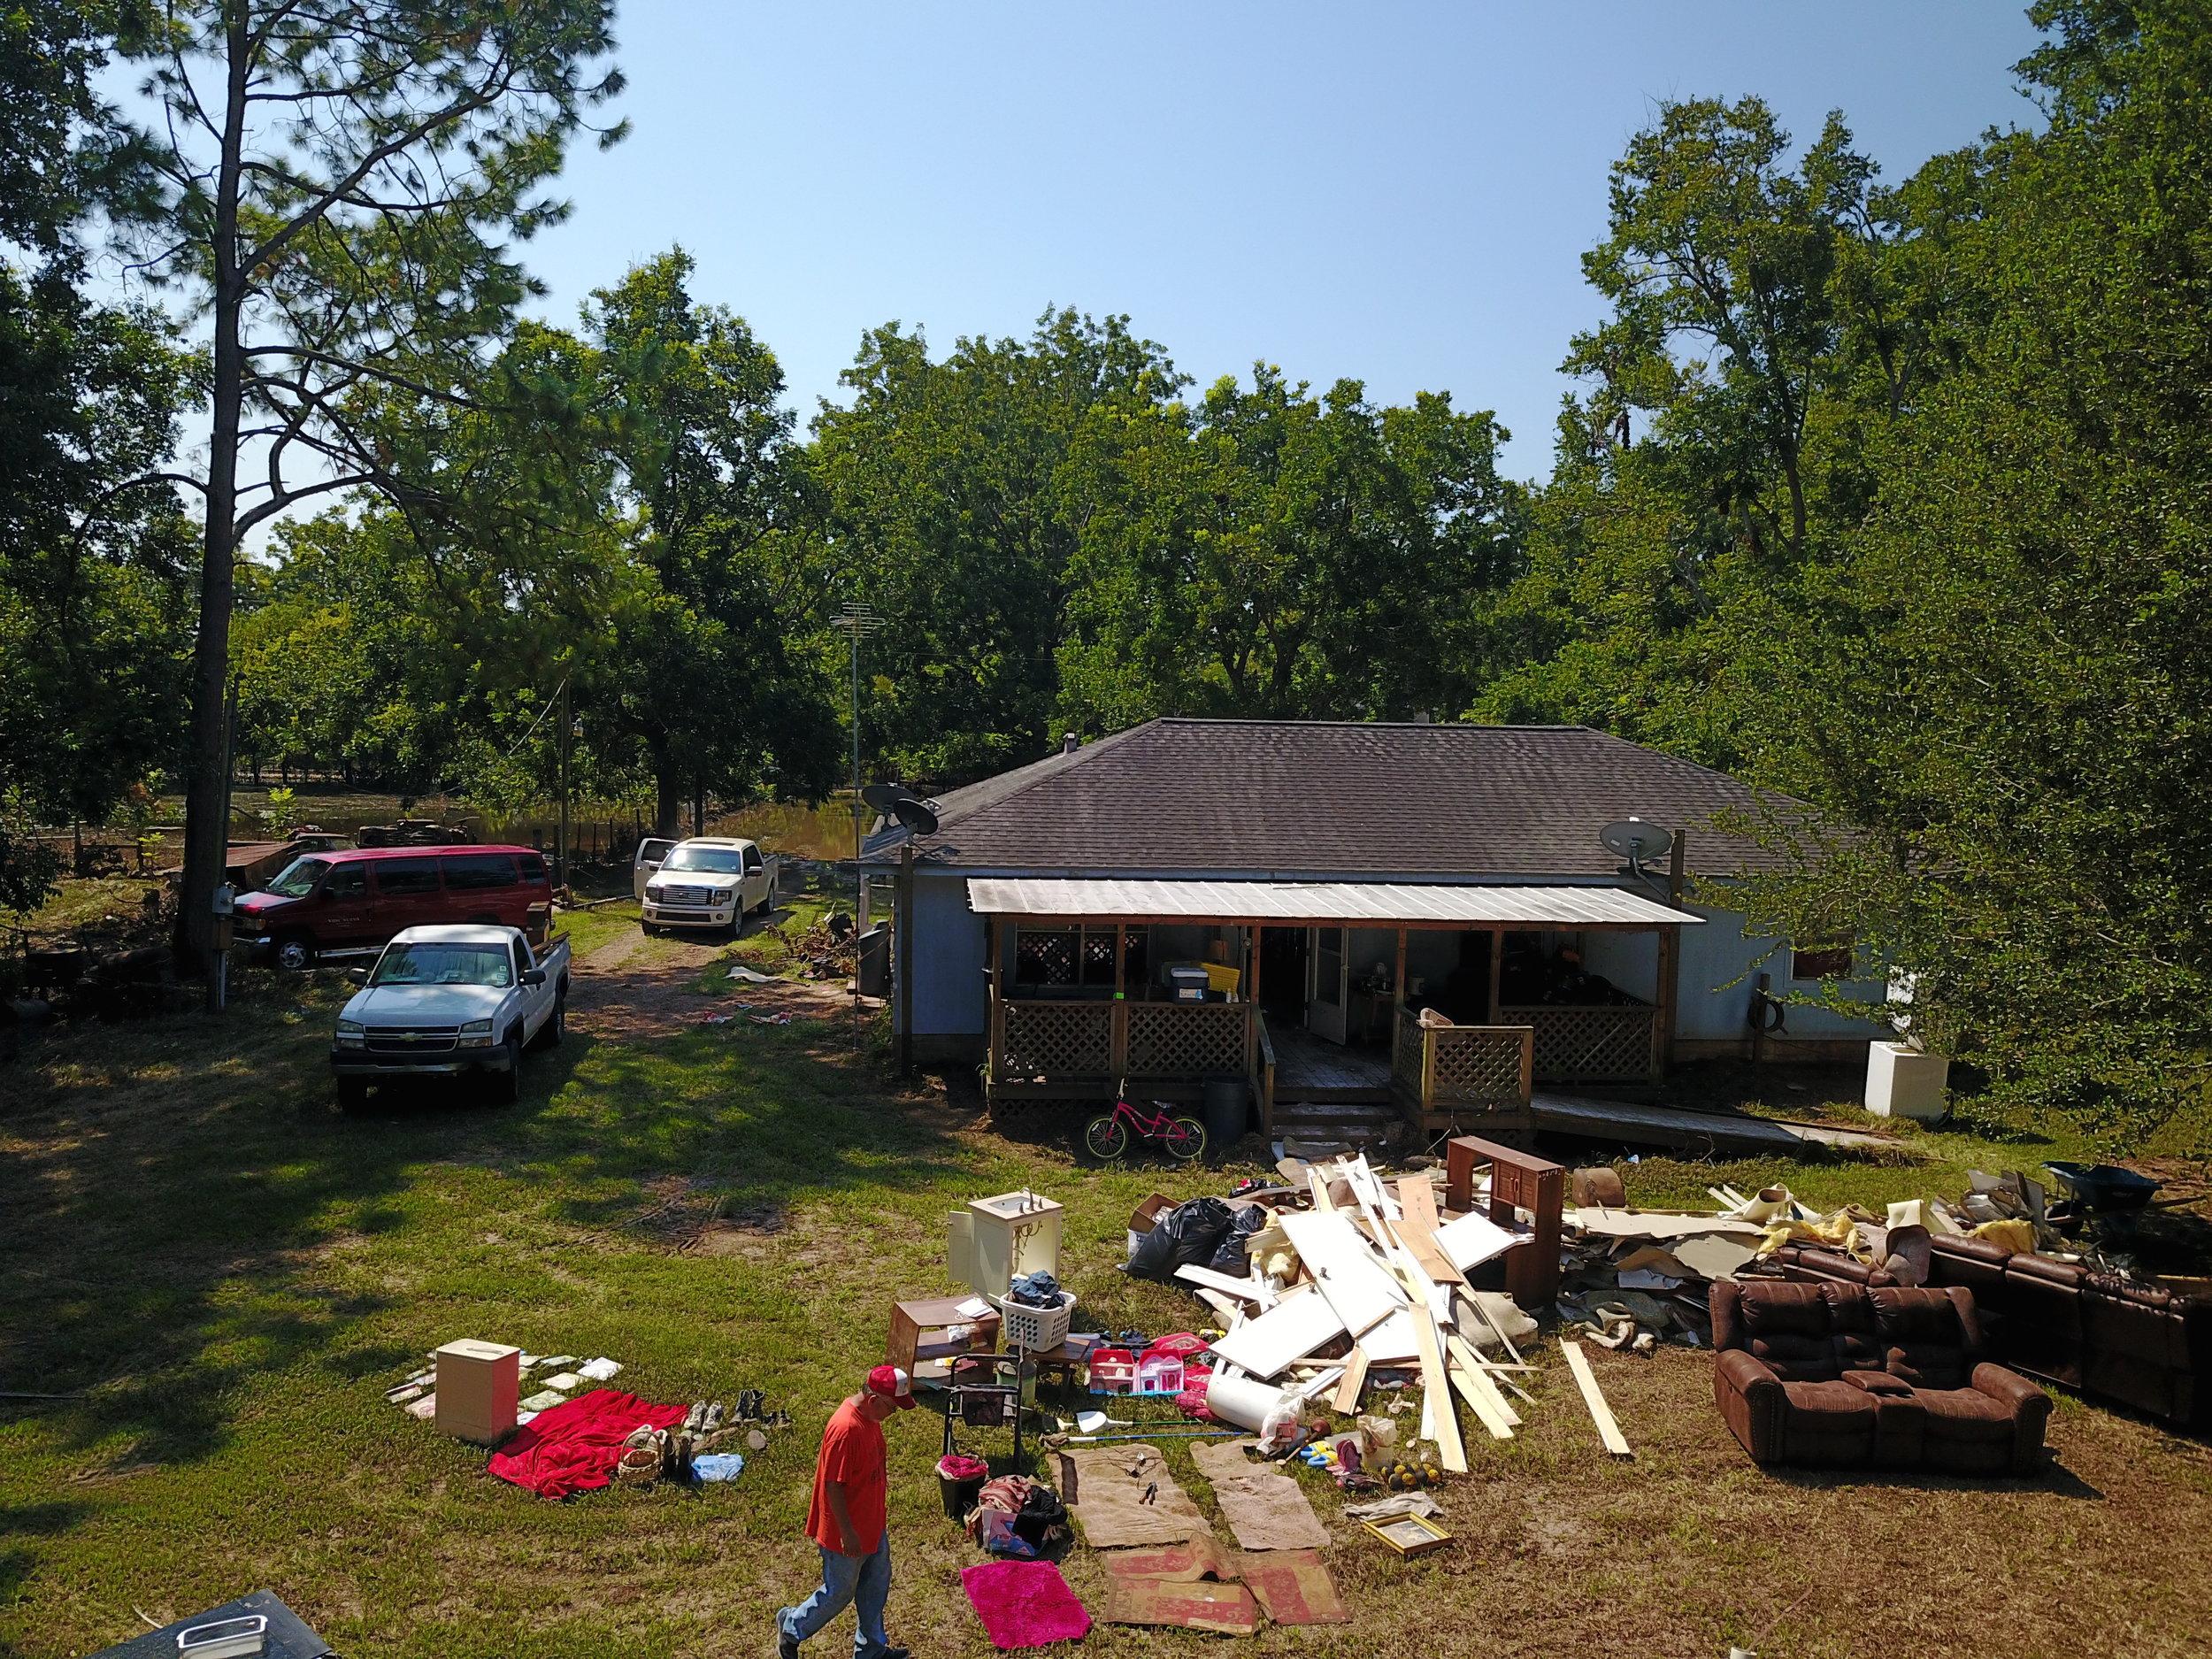 A pile of damage